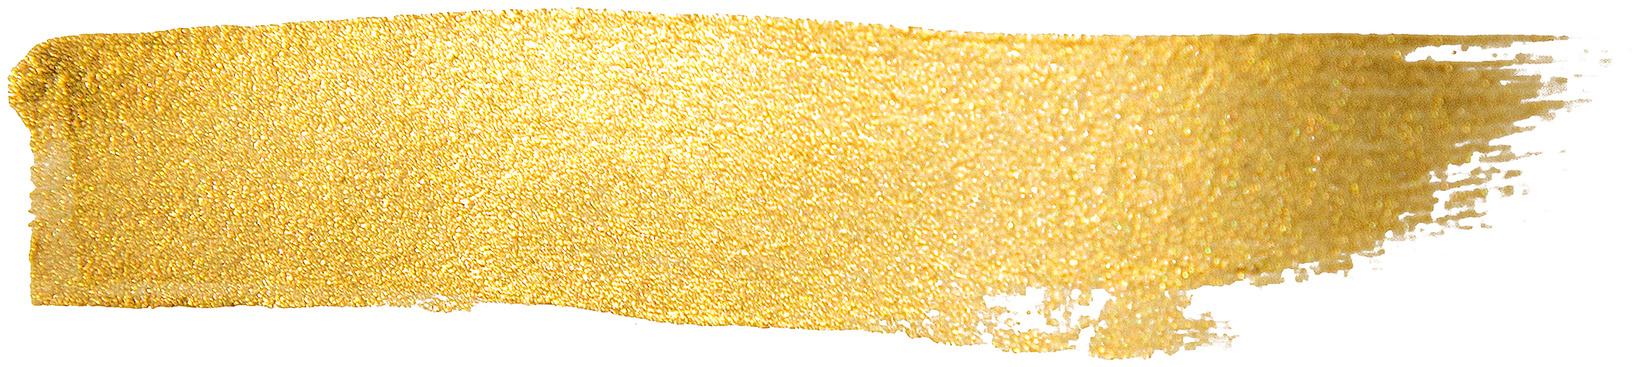 gold swatch.jpg